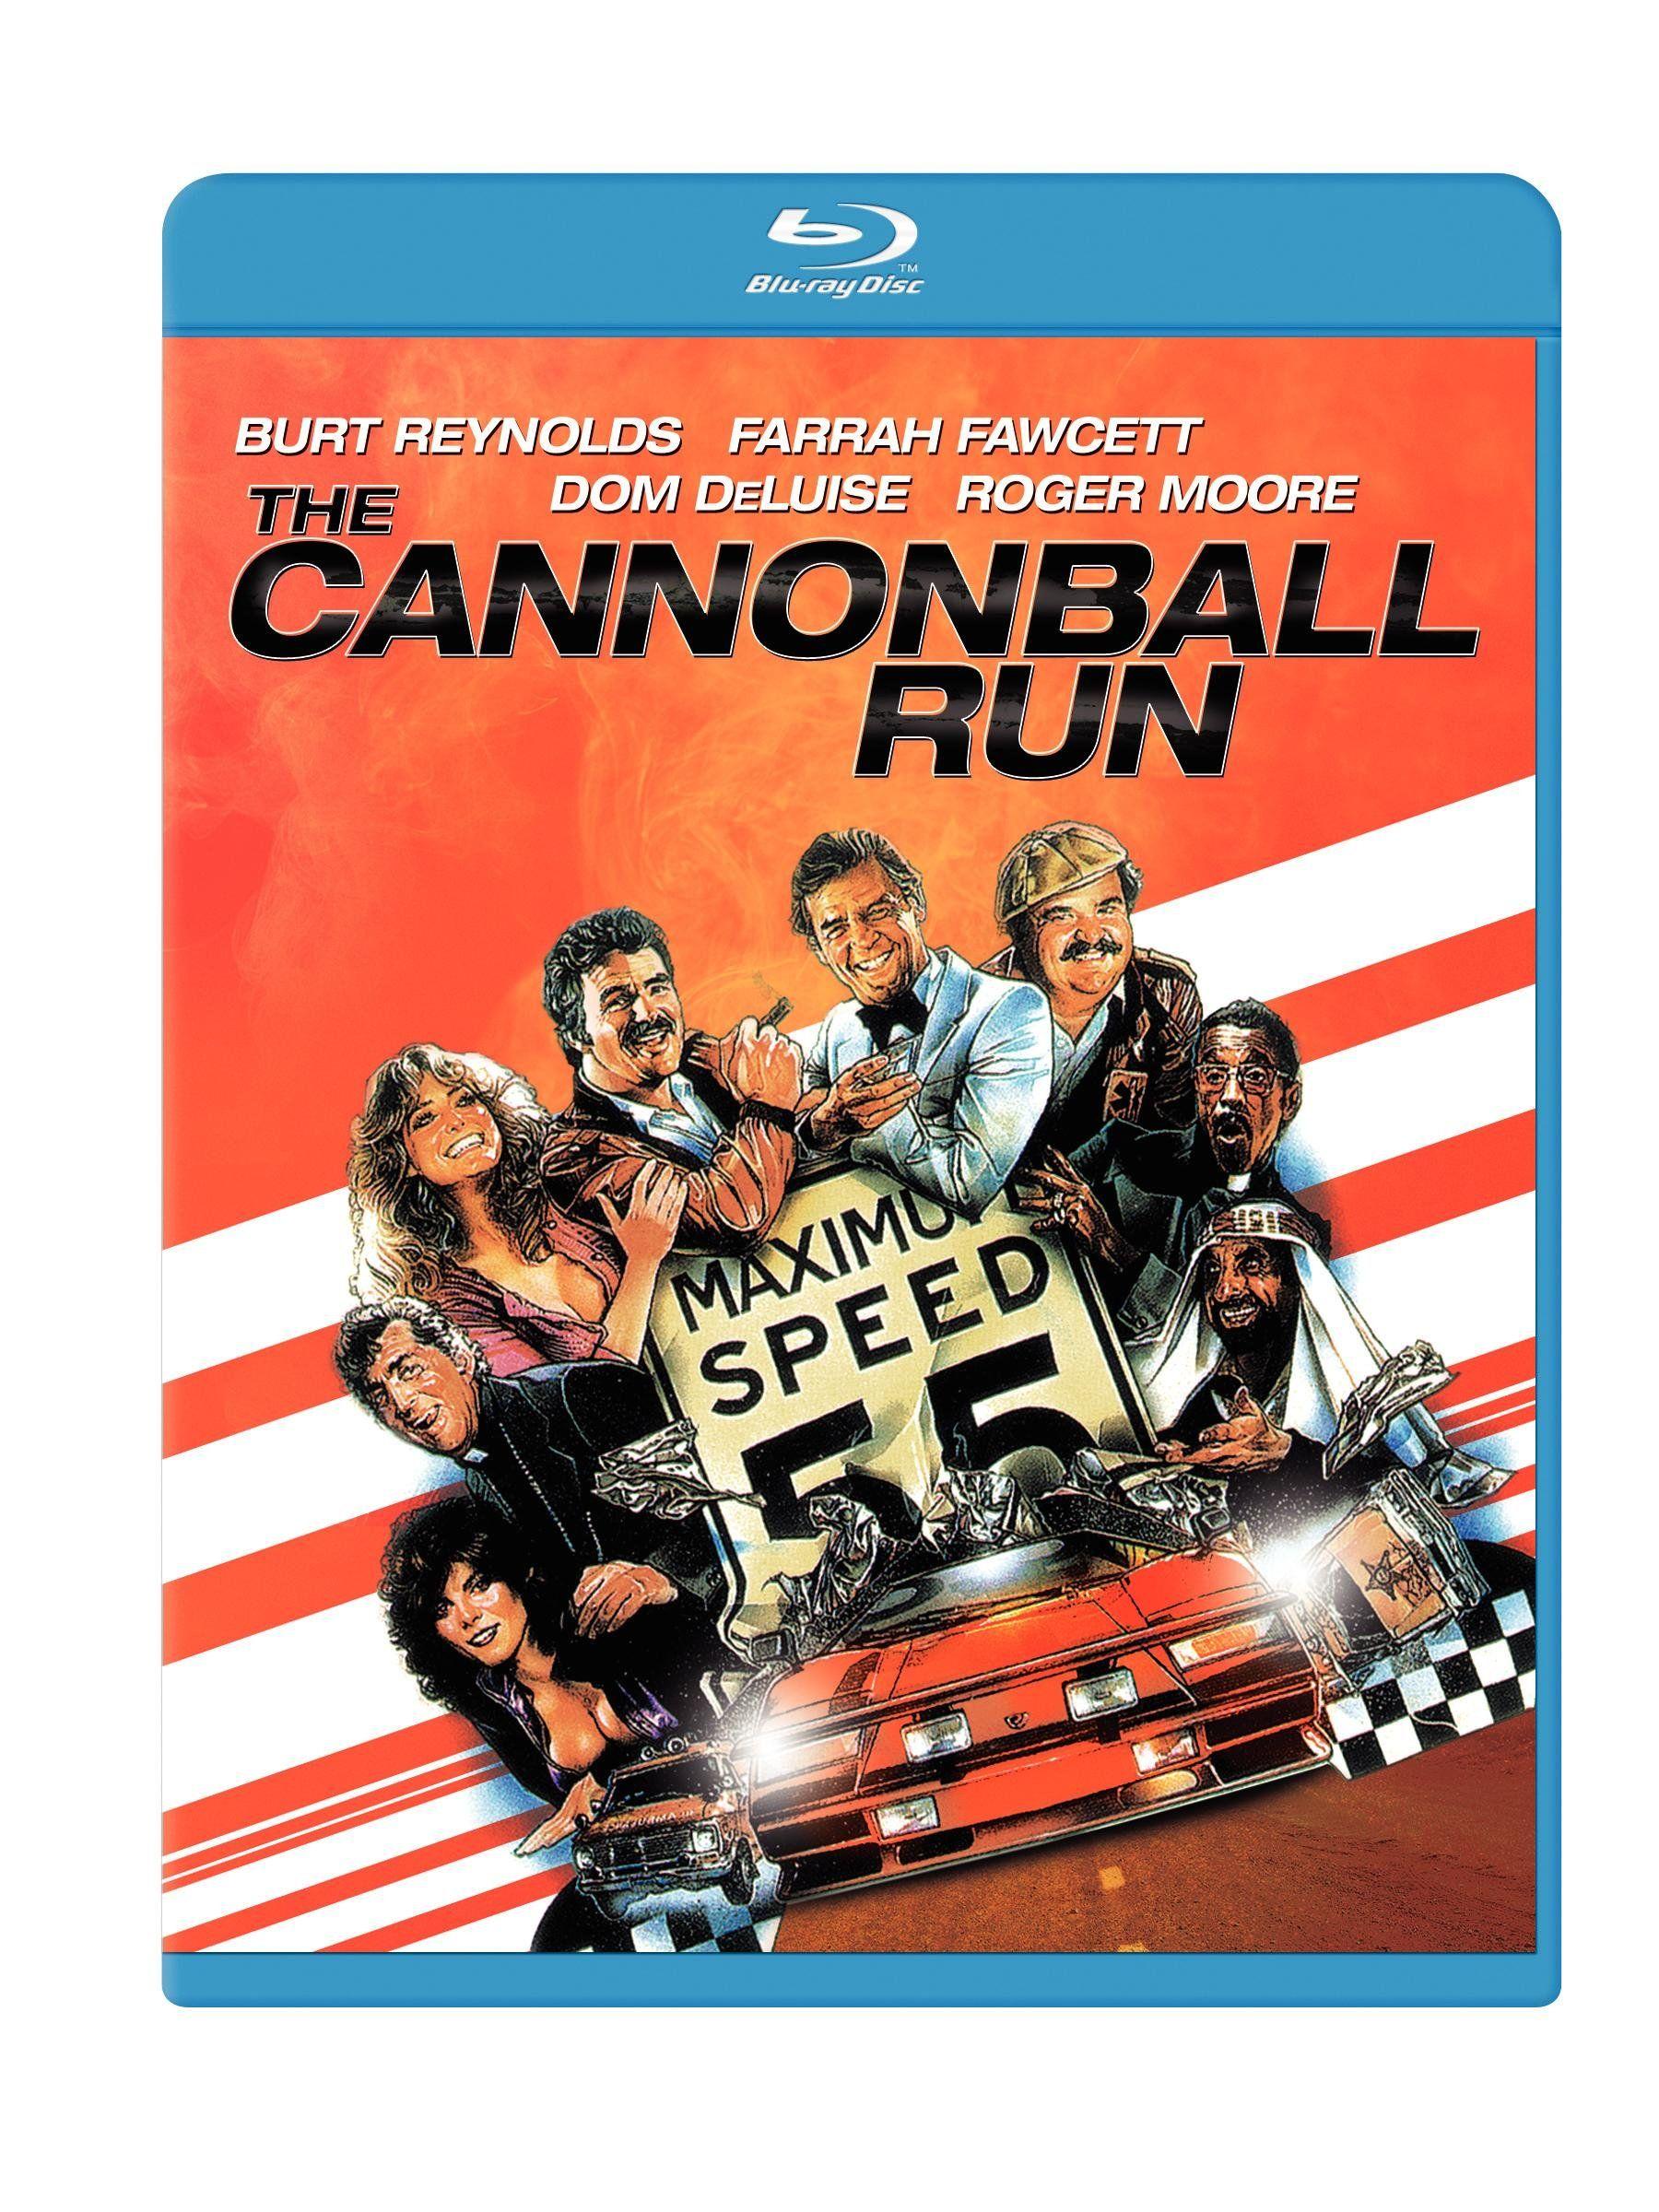 The Cannonball Run Blu Ray Your Pinterest Likes Short Circuit 27x40 Movie Poster 1986 Dean Martin Movies Burt Reynolds Roger